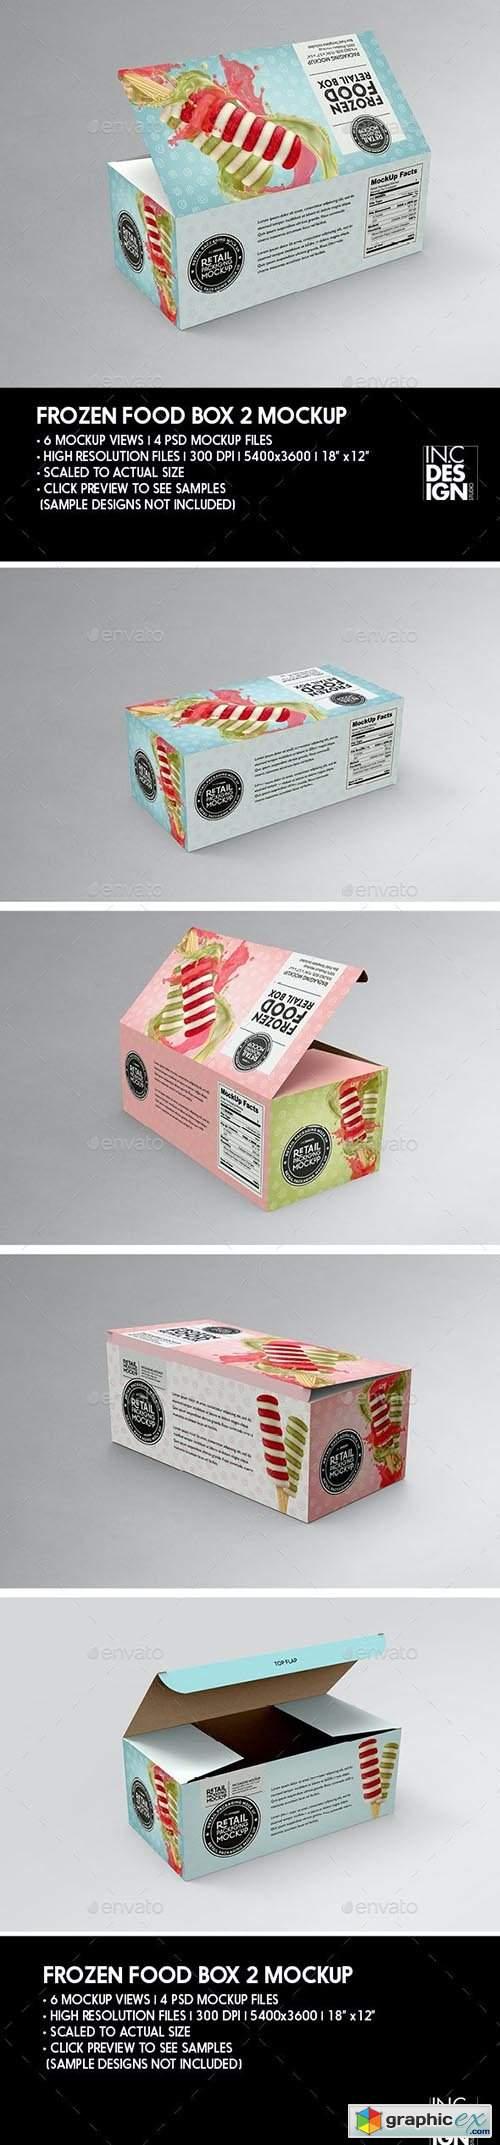 Big Frozen Food Box Packaging Mockup